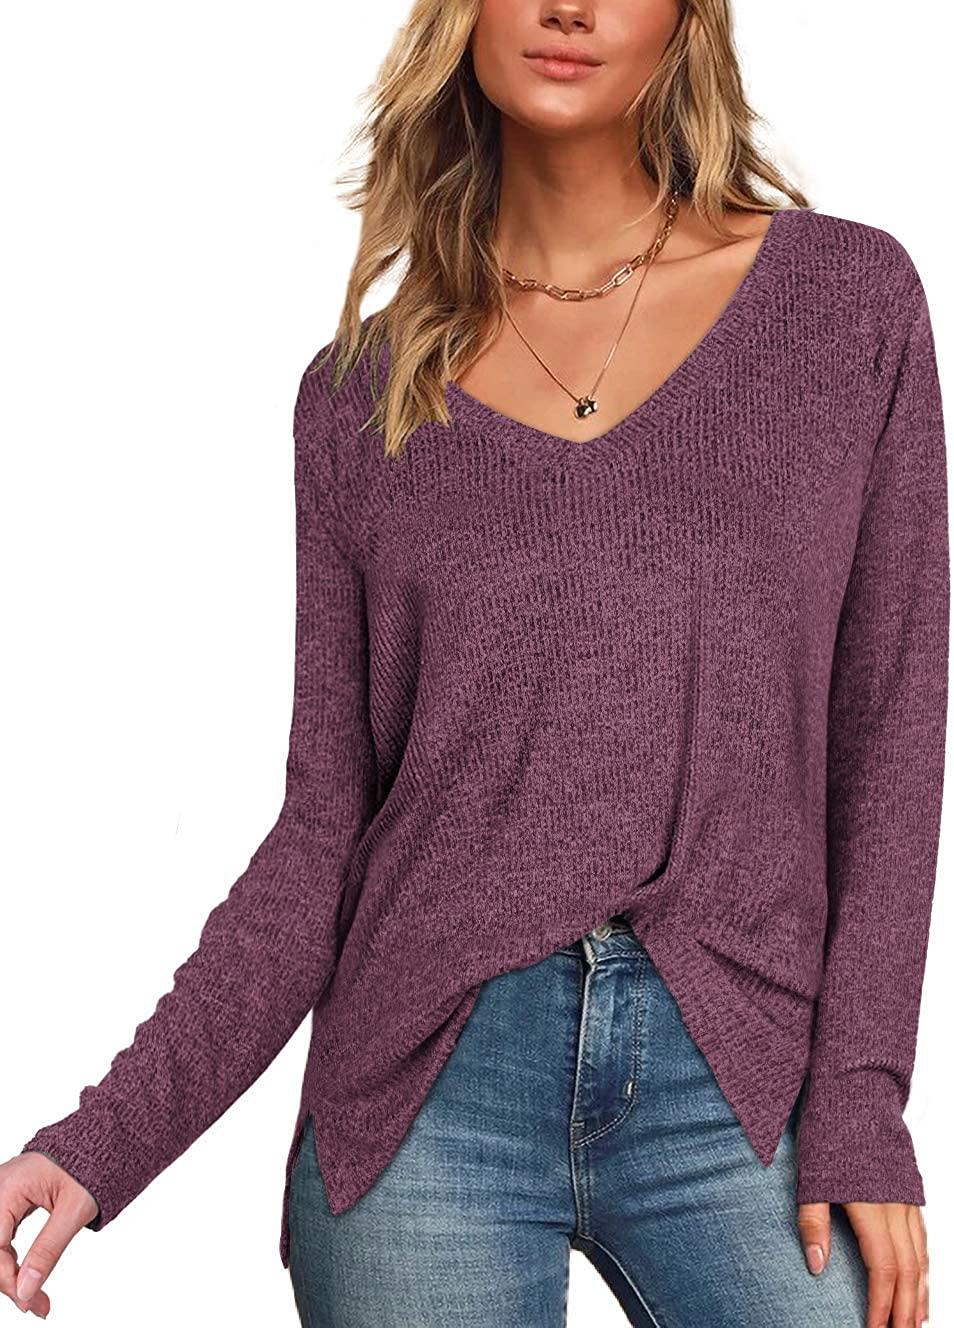 Women's Fall Sweater Long Sleeve V Neck Casual Tops Sweaterhirts